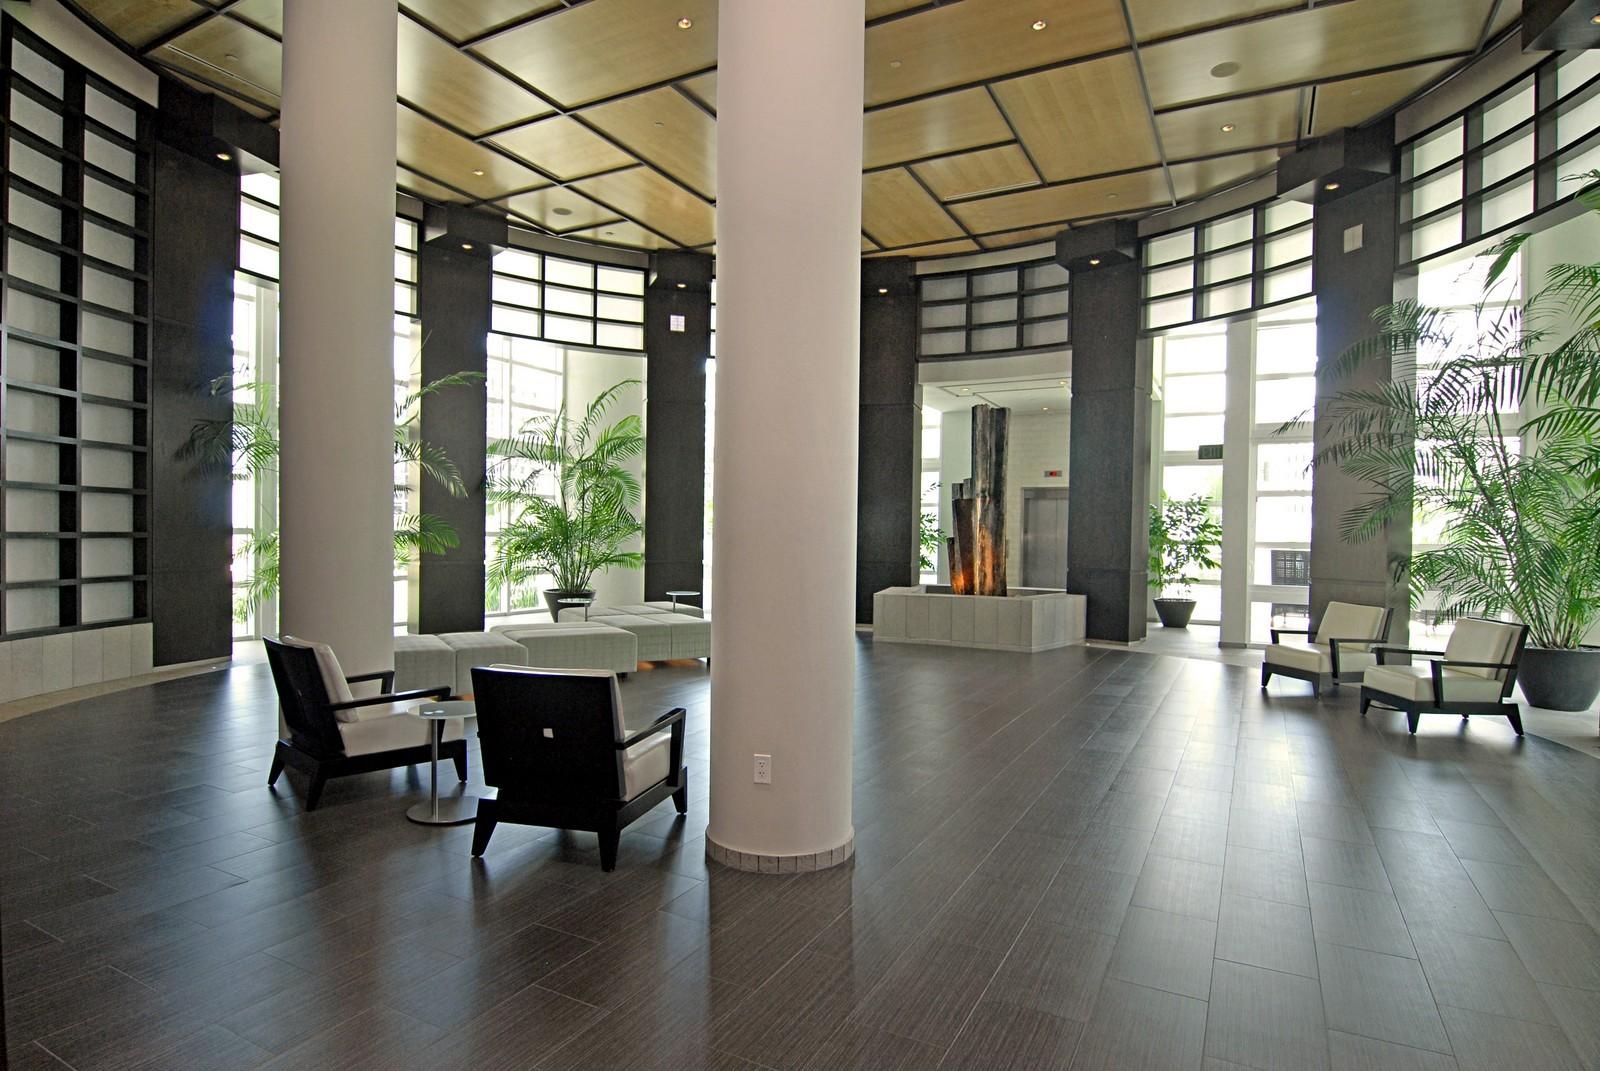 Real Estate Photography - 900 Brickell Key Blvd, Apt 3004, Miami, FL, 33131 - Lobby